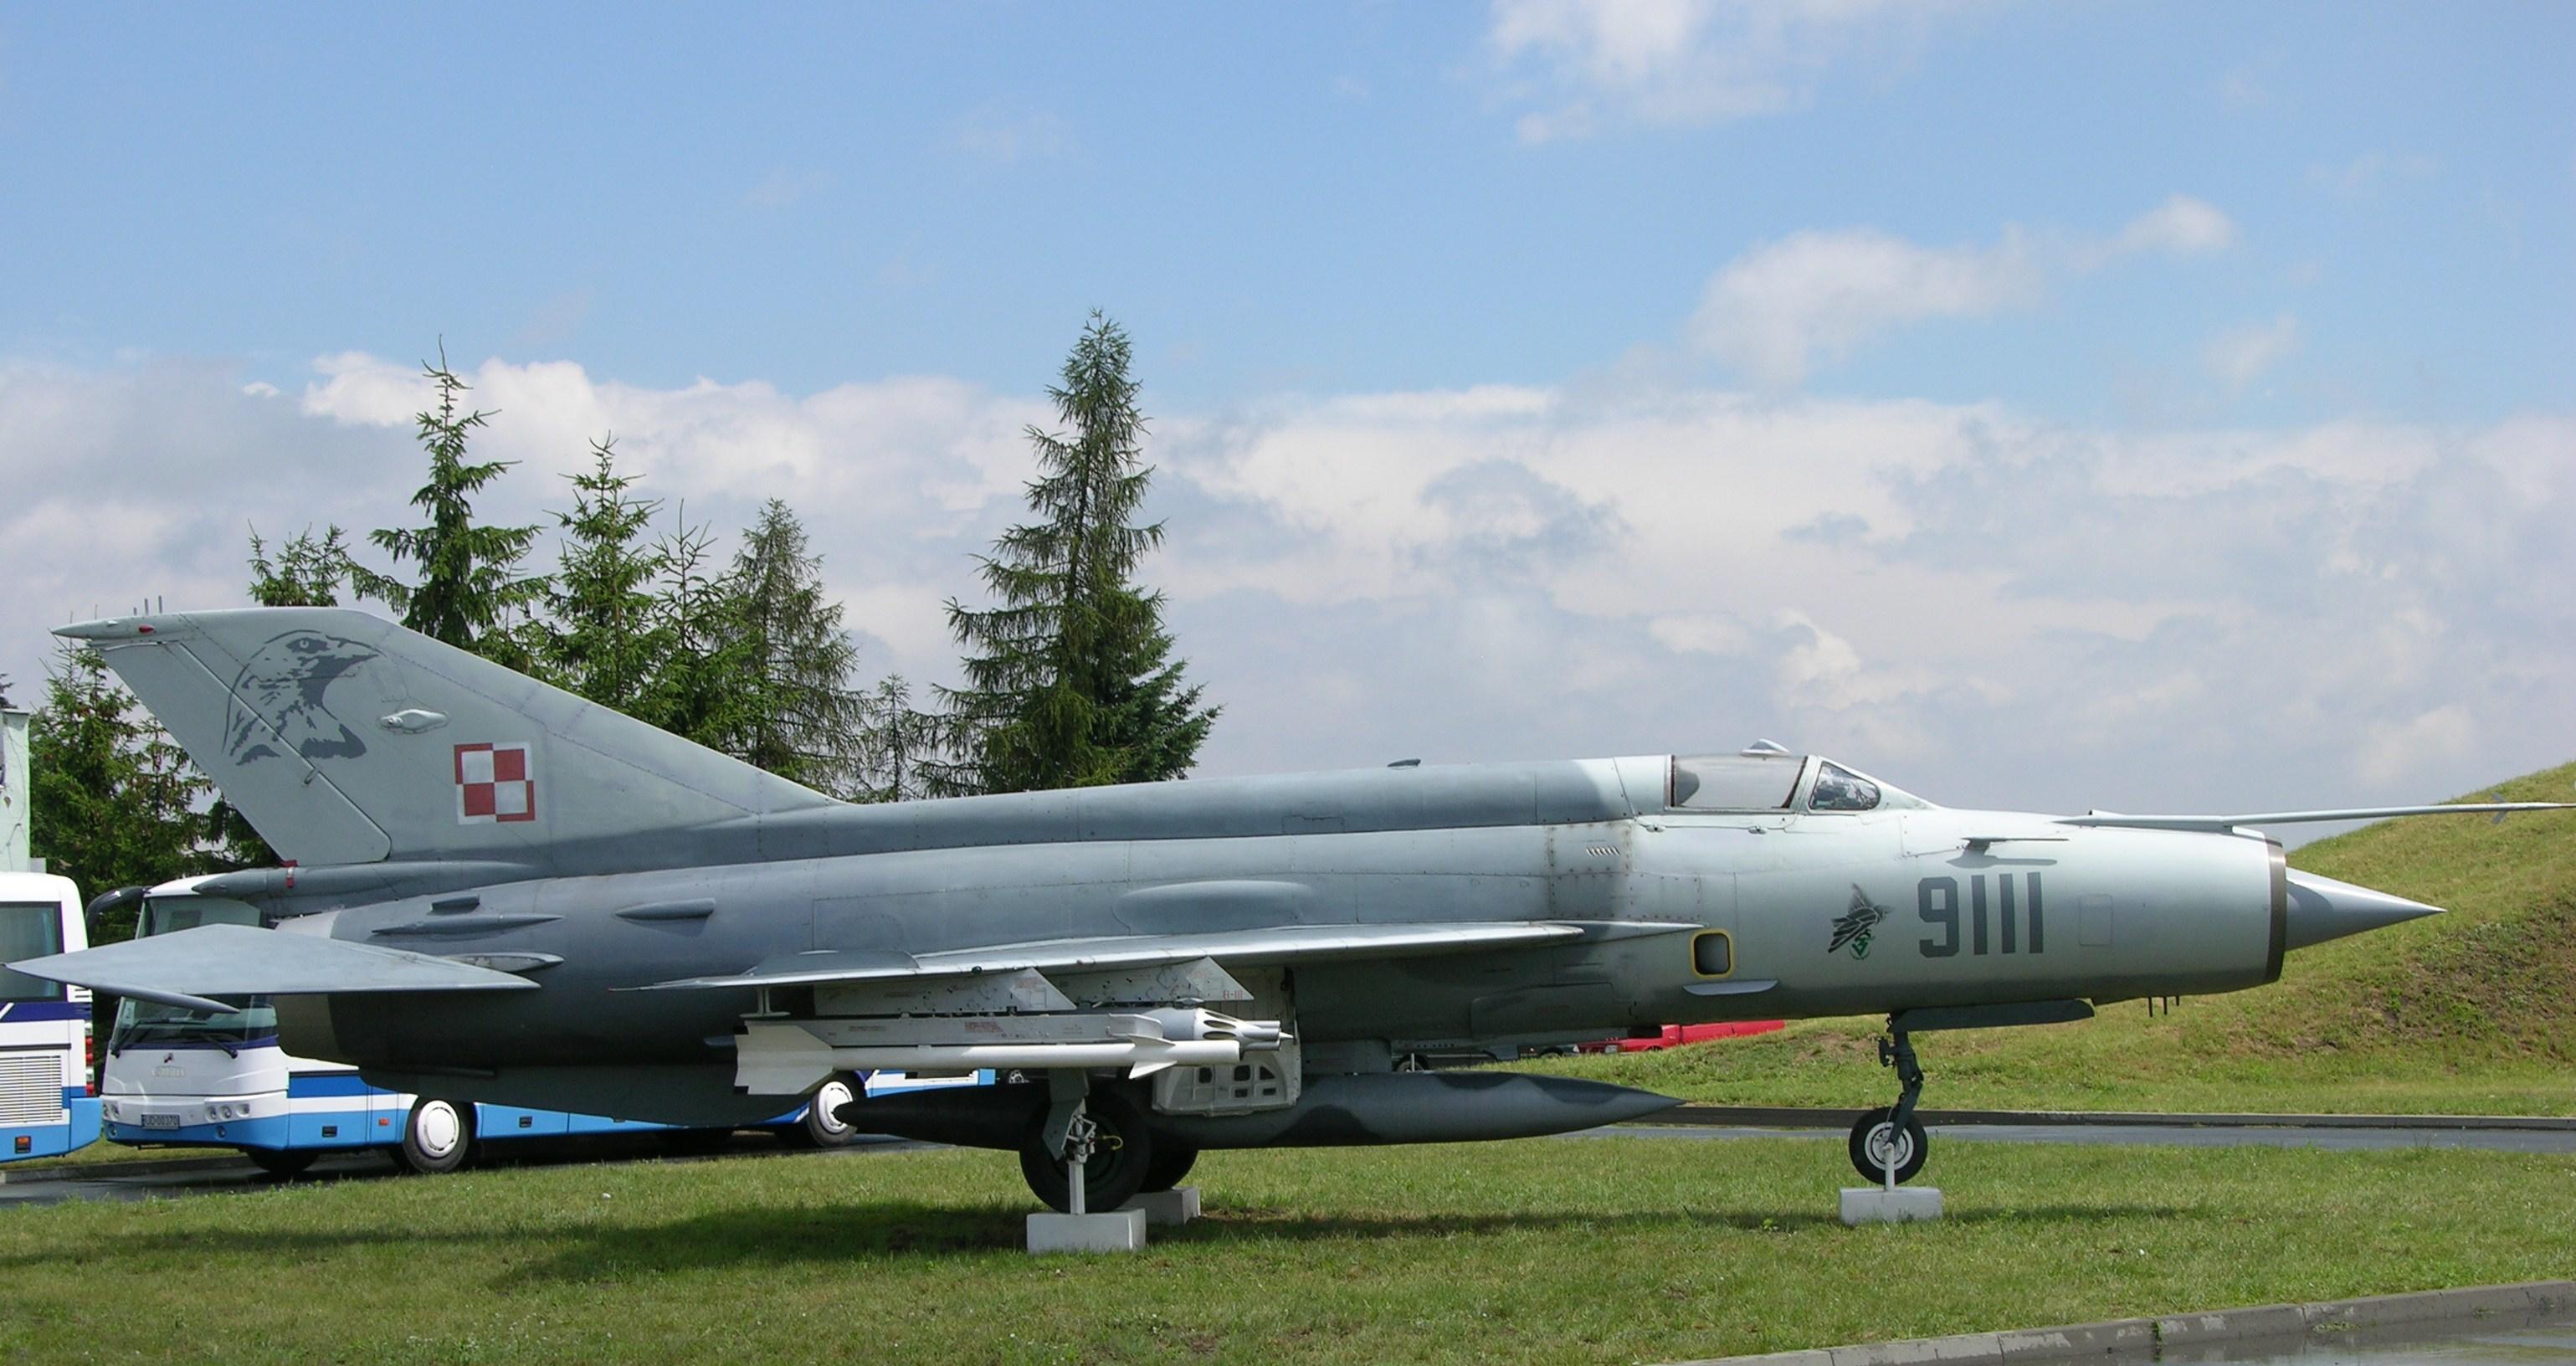 File:Poznan Krzesiny Poland Polish Air Force 9111 MiG 21MF Preserved (3118871102